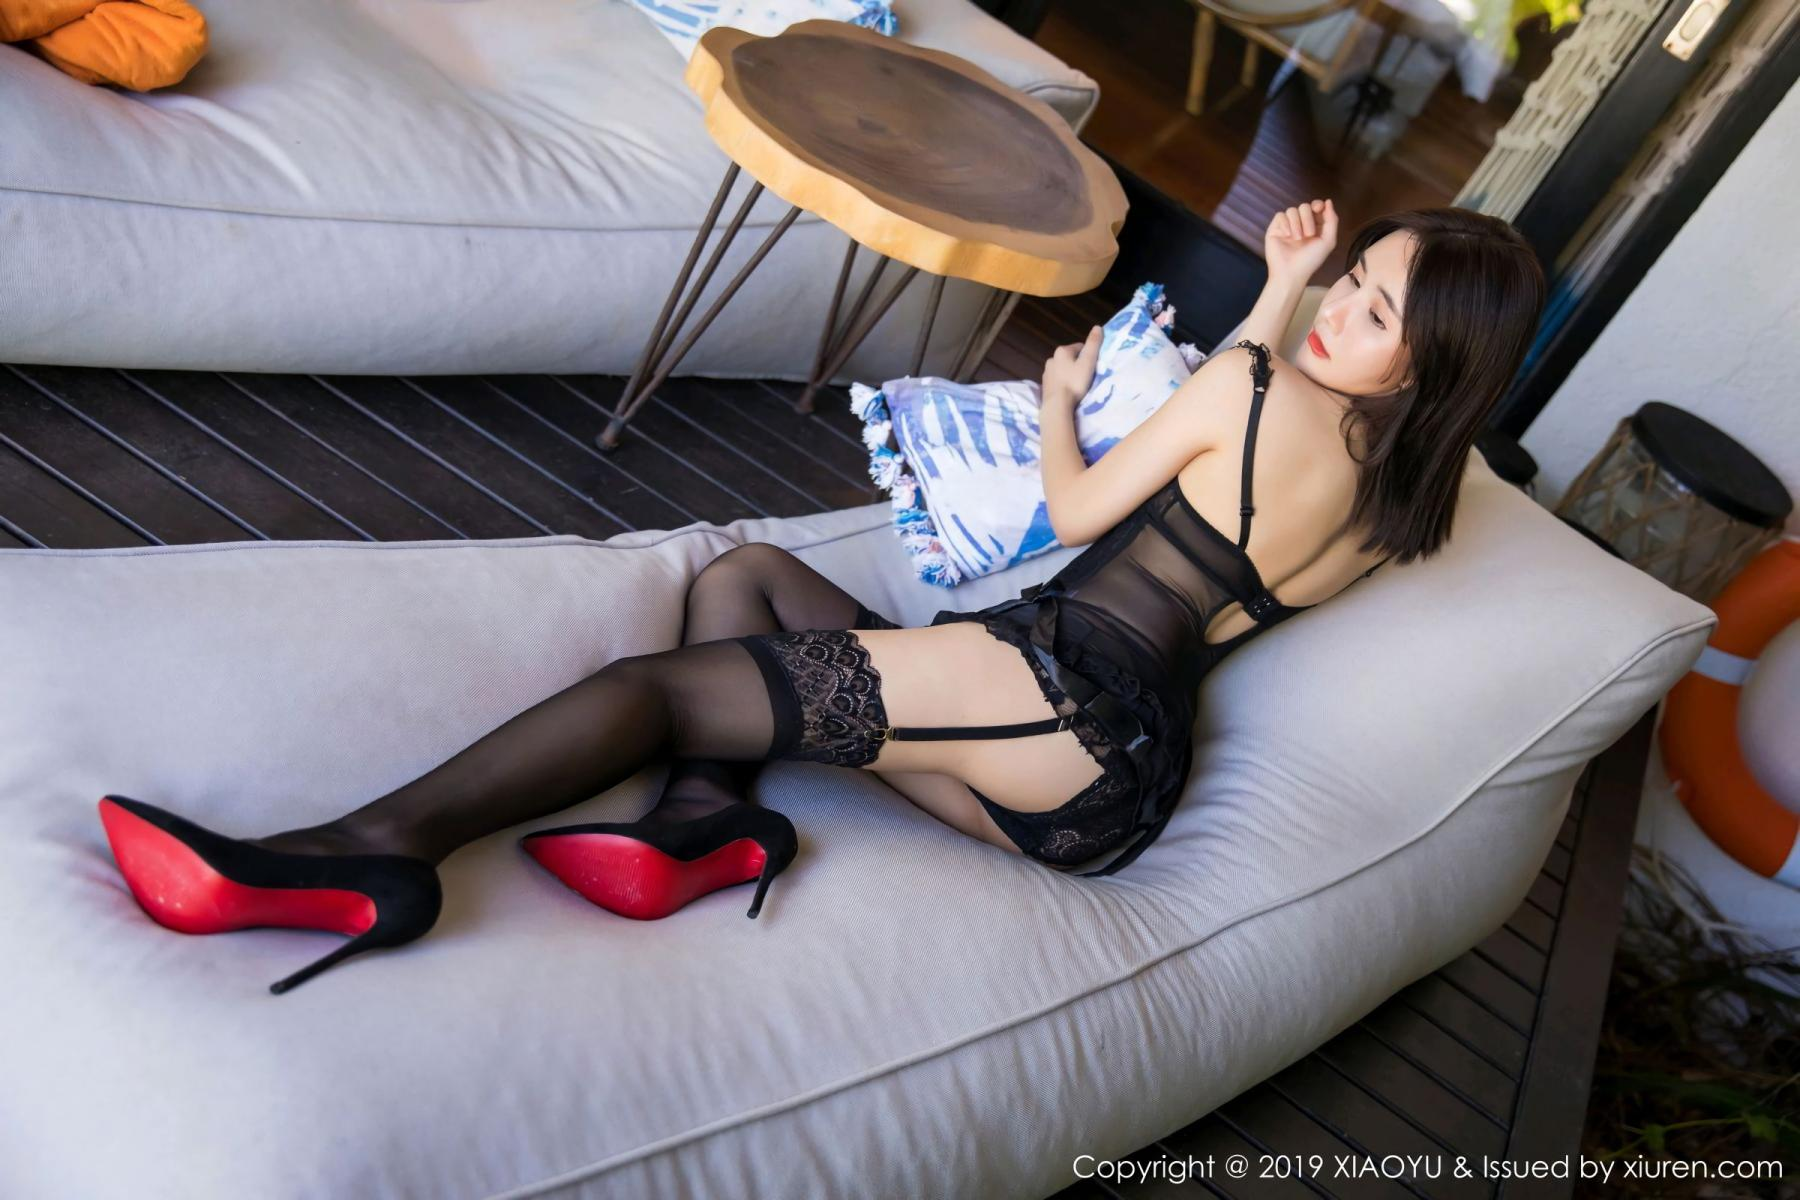 [XiaoYu] Vol.102 Lin Lin A I L I N 11P, Black Silk, Lin Lin Ailin, Tall, XiaoYu